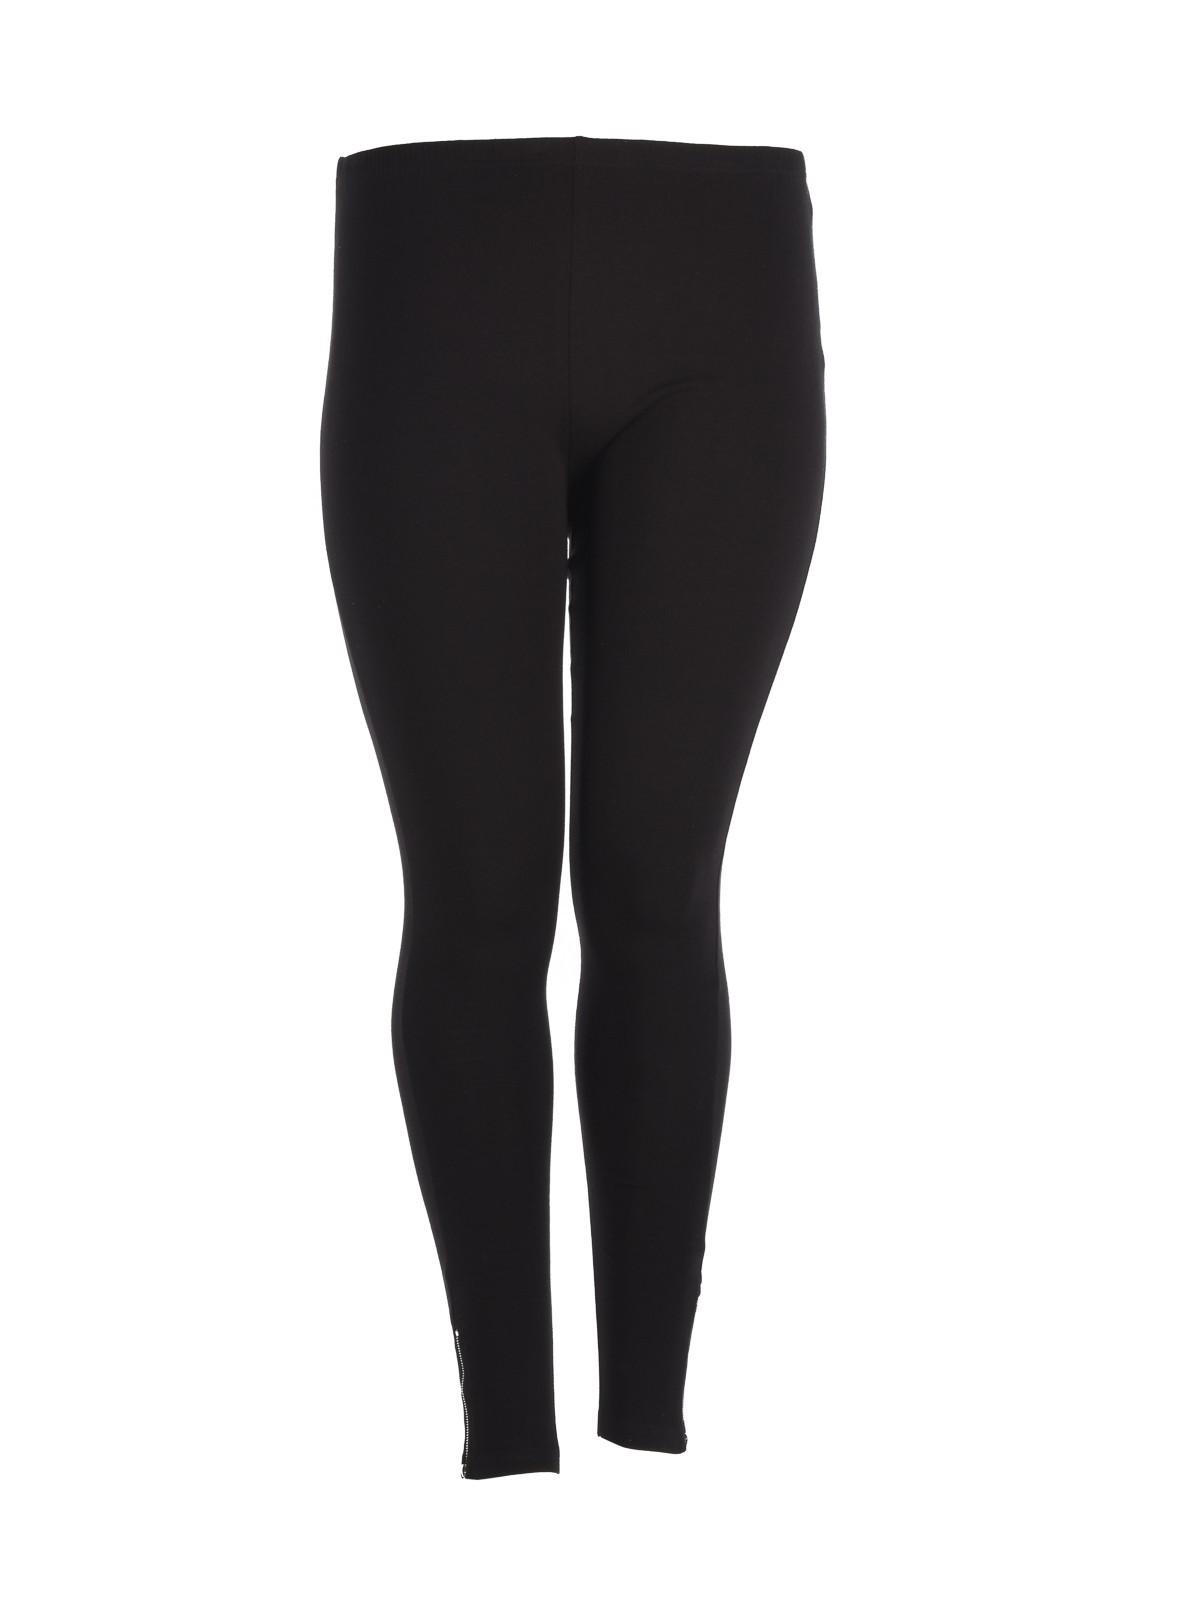 8e44aaad584e0b Pantalon chino noir grande taille femme - DistriCenter